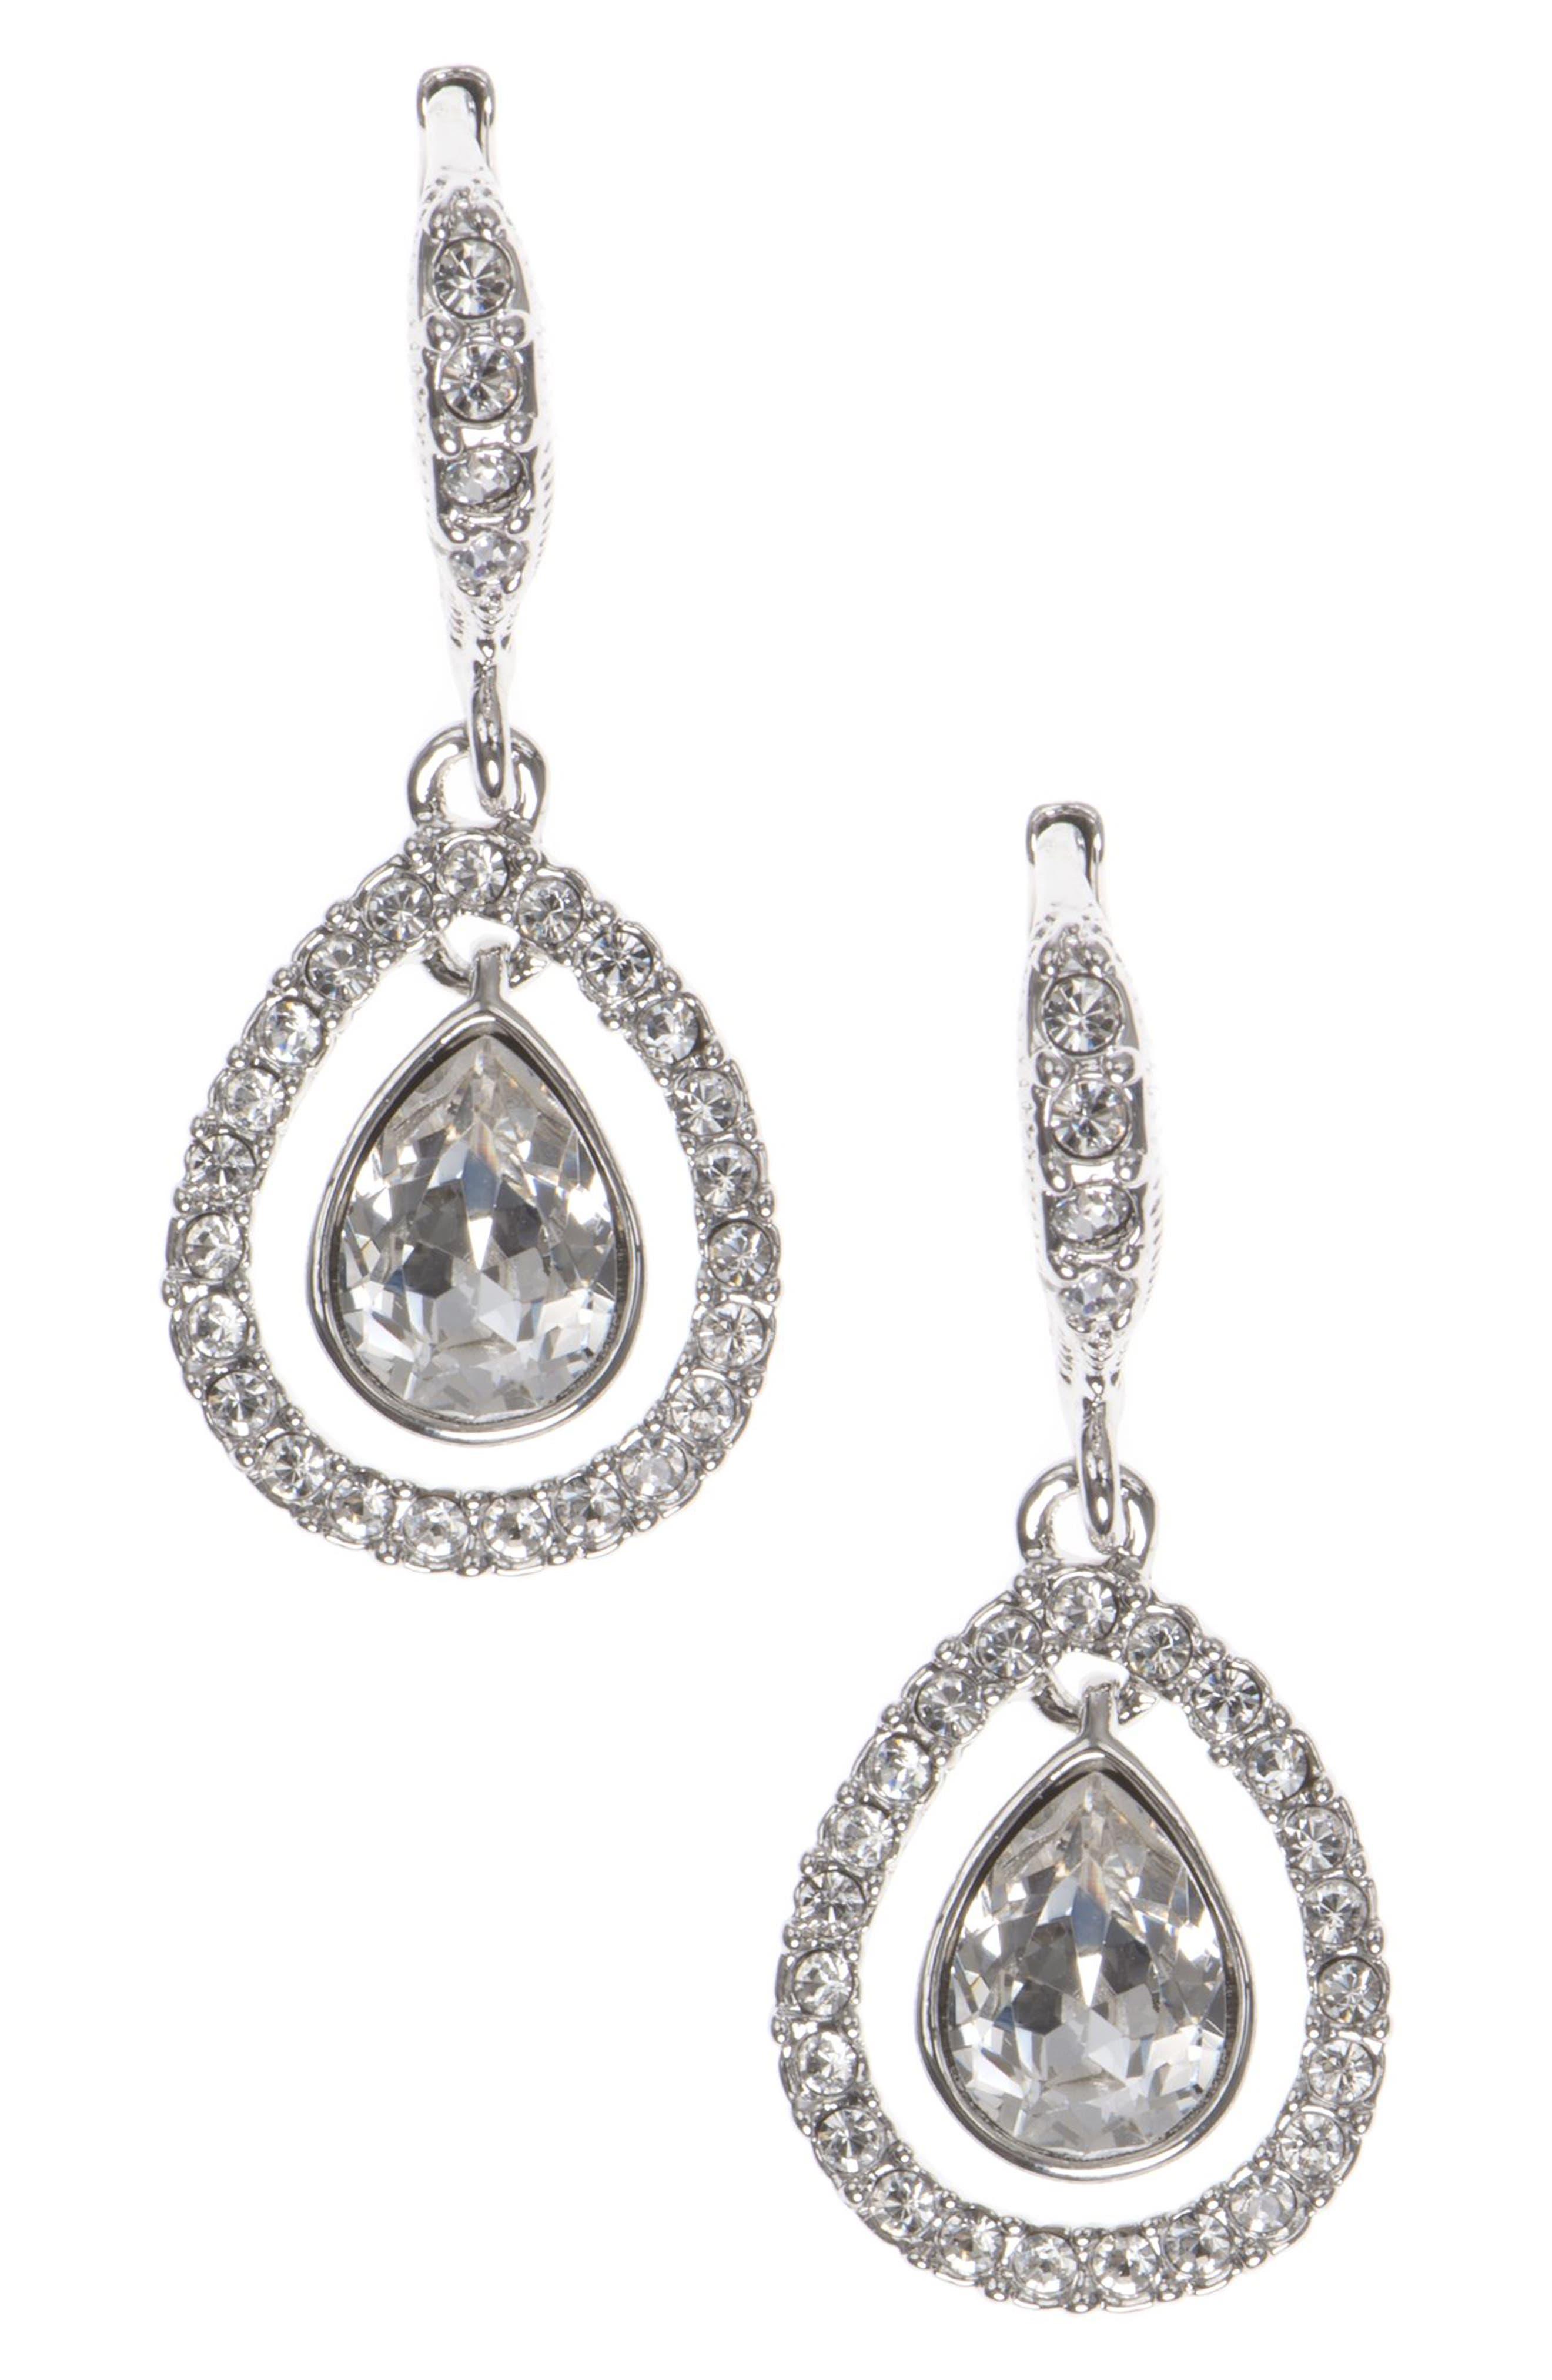 Crystal Drop Earrings,                             Main thumbnail 1, color,                             SILVER